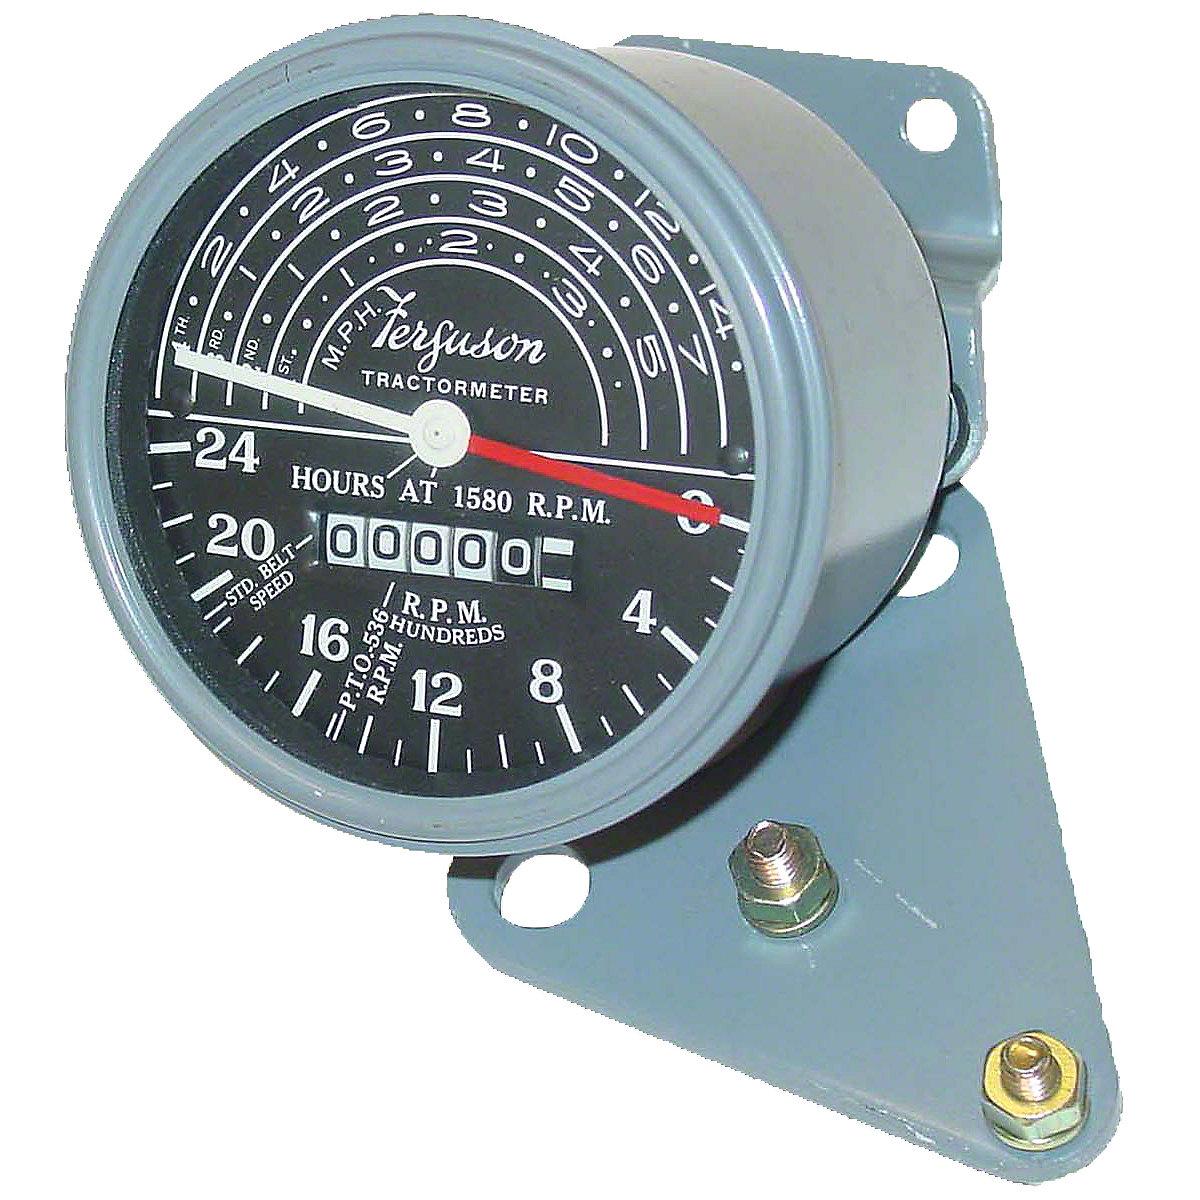 Tachometer For Massey Ferguson: TO20, TO30.